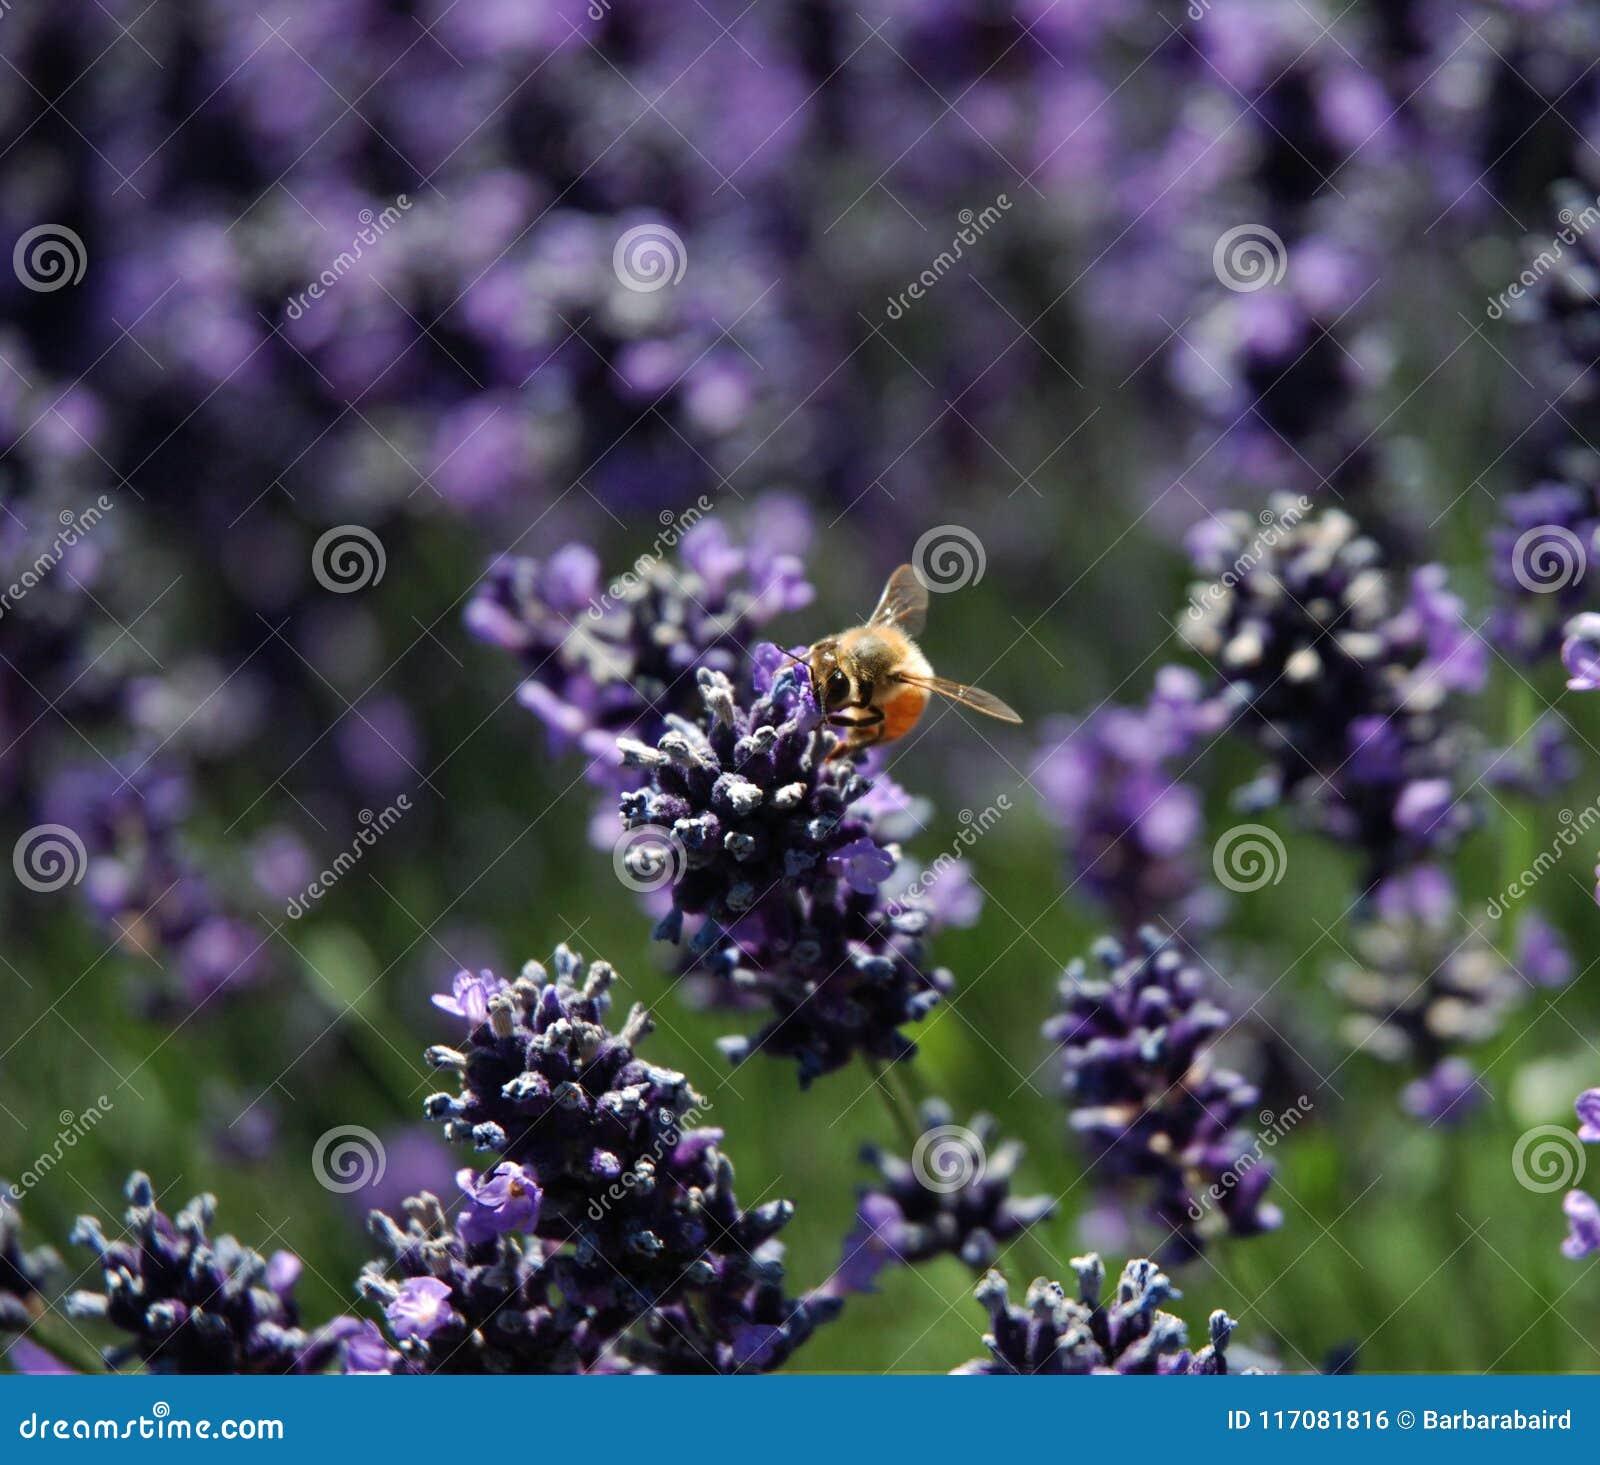 Stuntel Bijenzitting op Lavendel